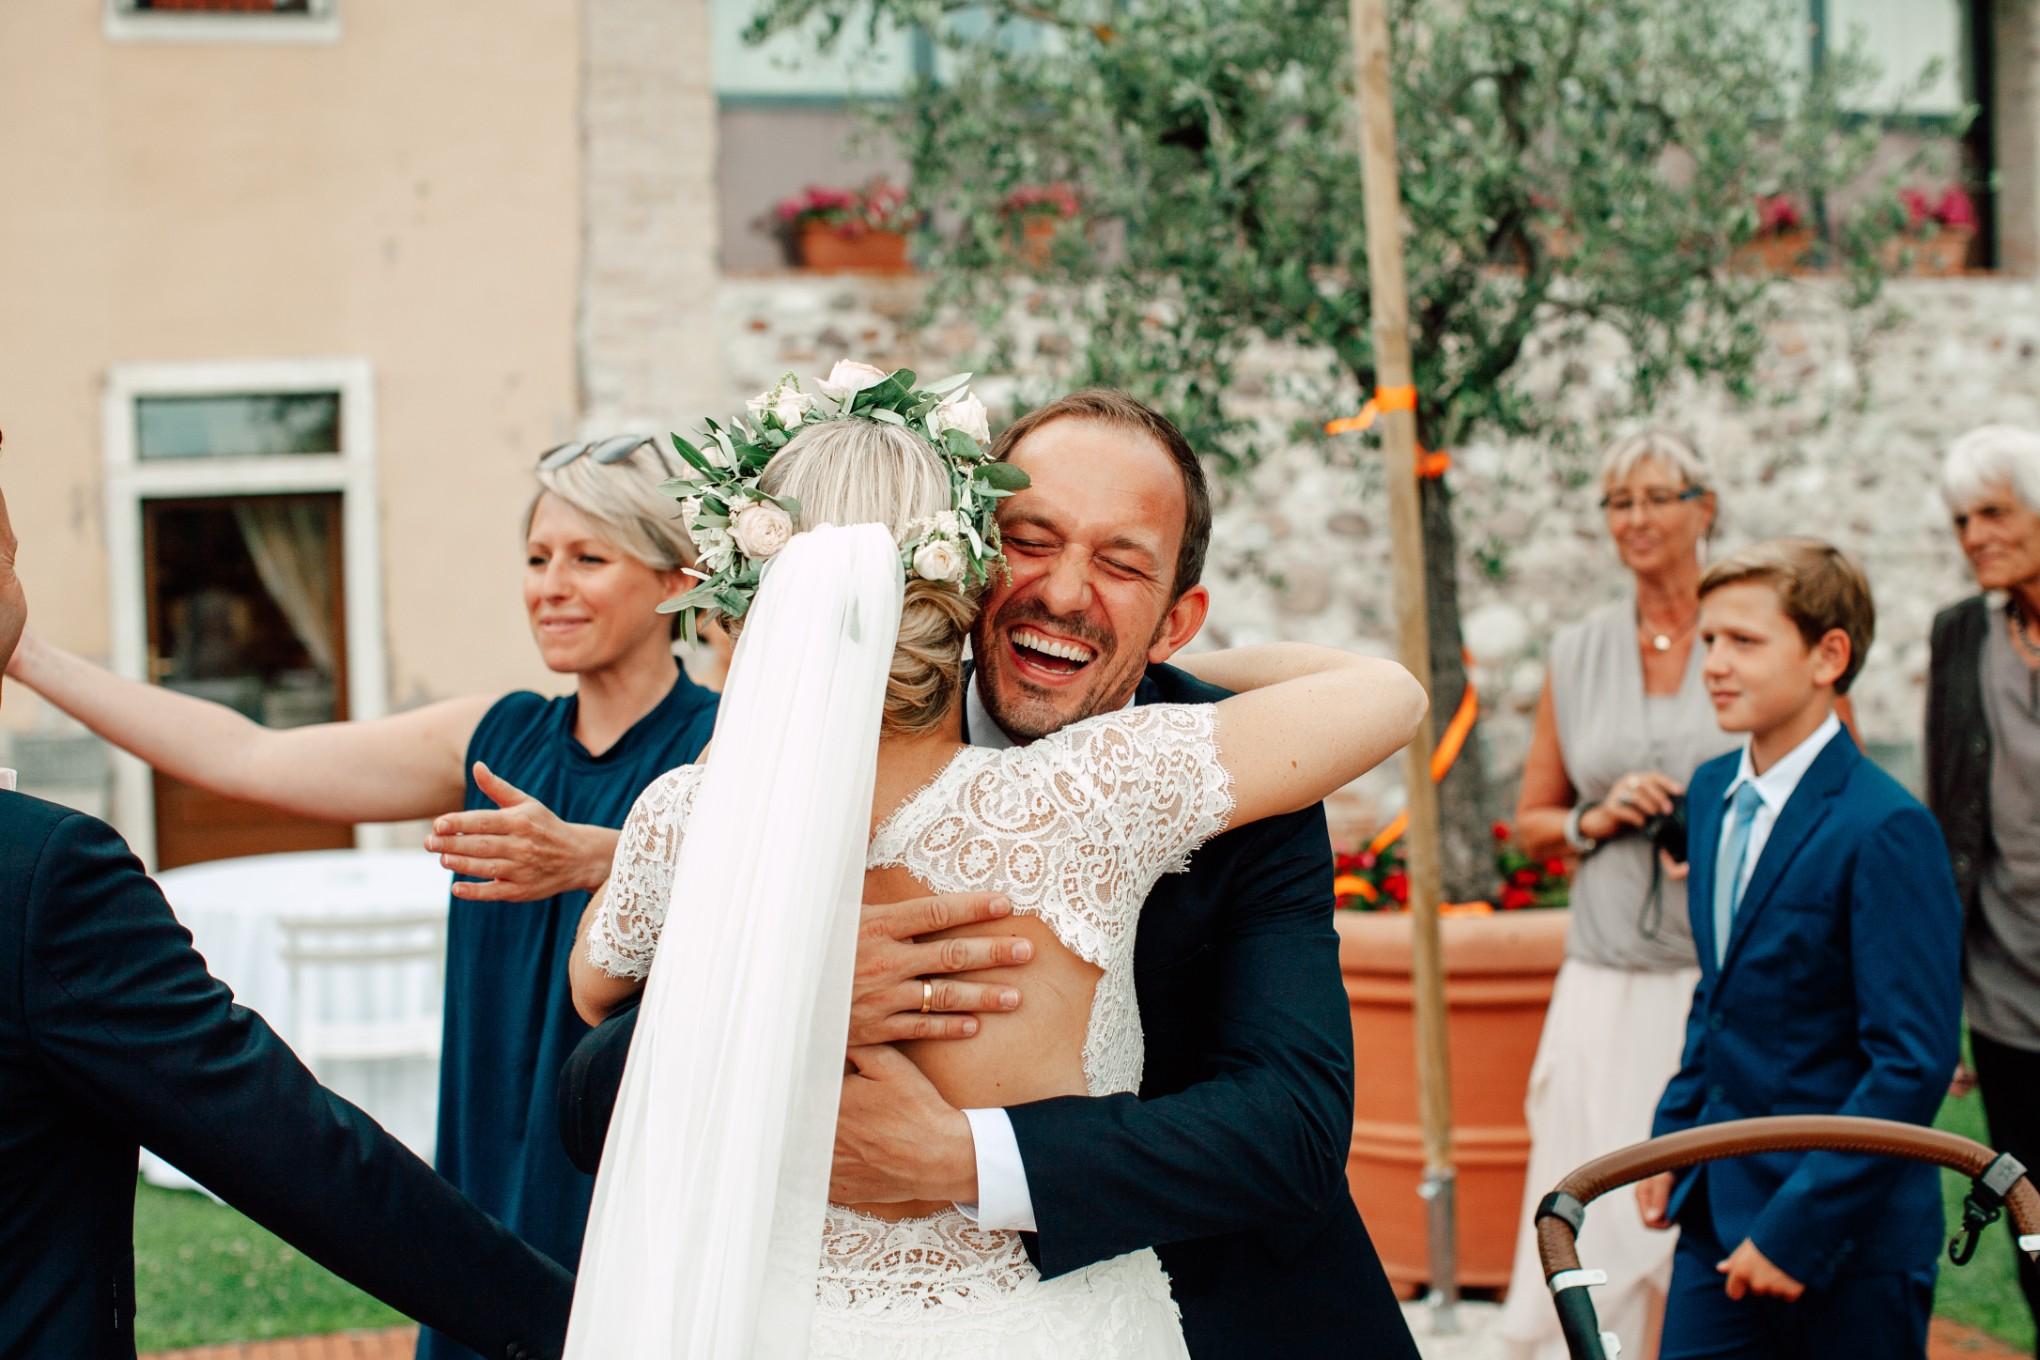 Italy-Gardasee-Tenuta-La-Presa-Pia-Anna-Christian-Photography-BP-R-12.jpg